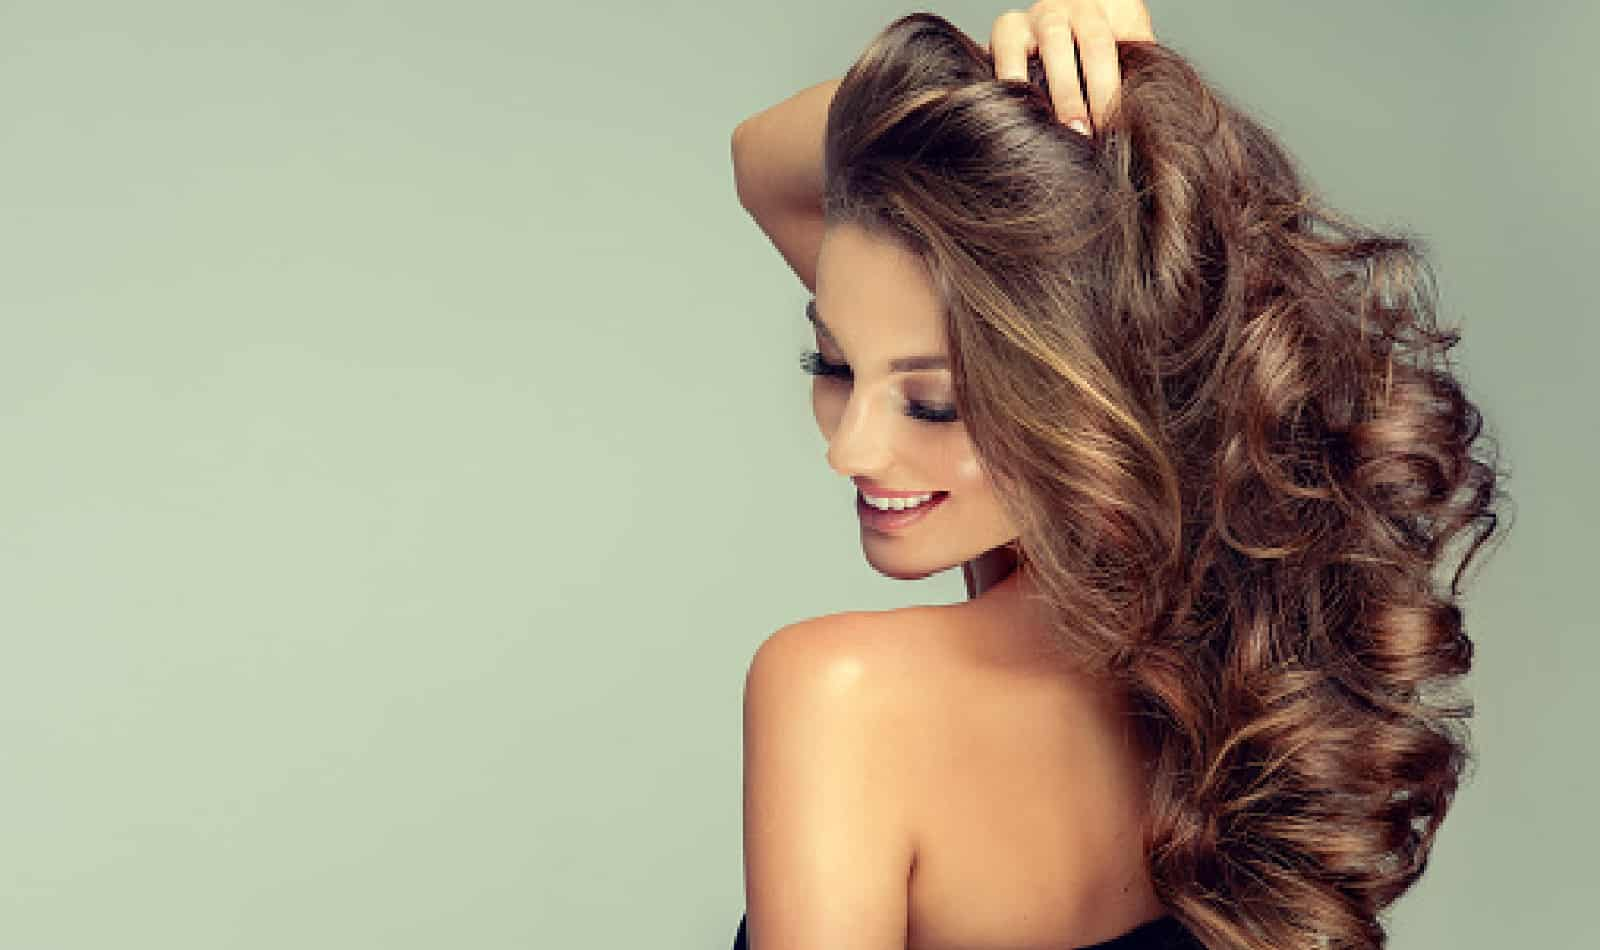 anti aging hair tips